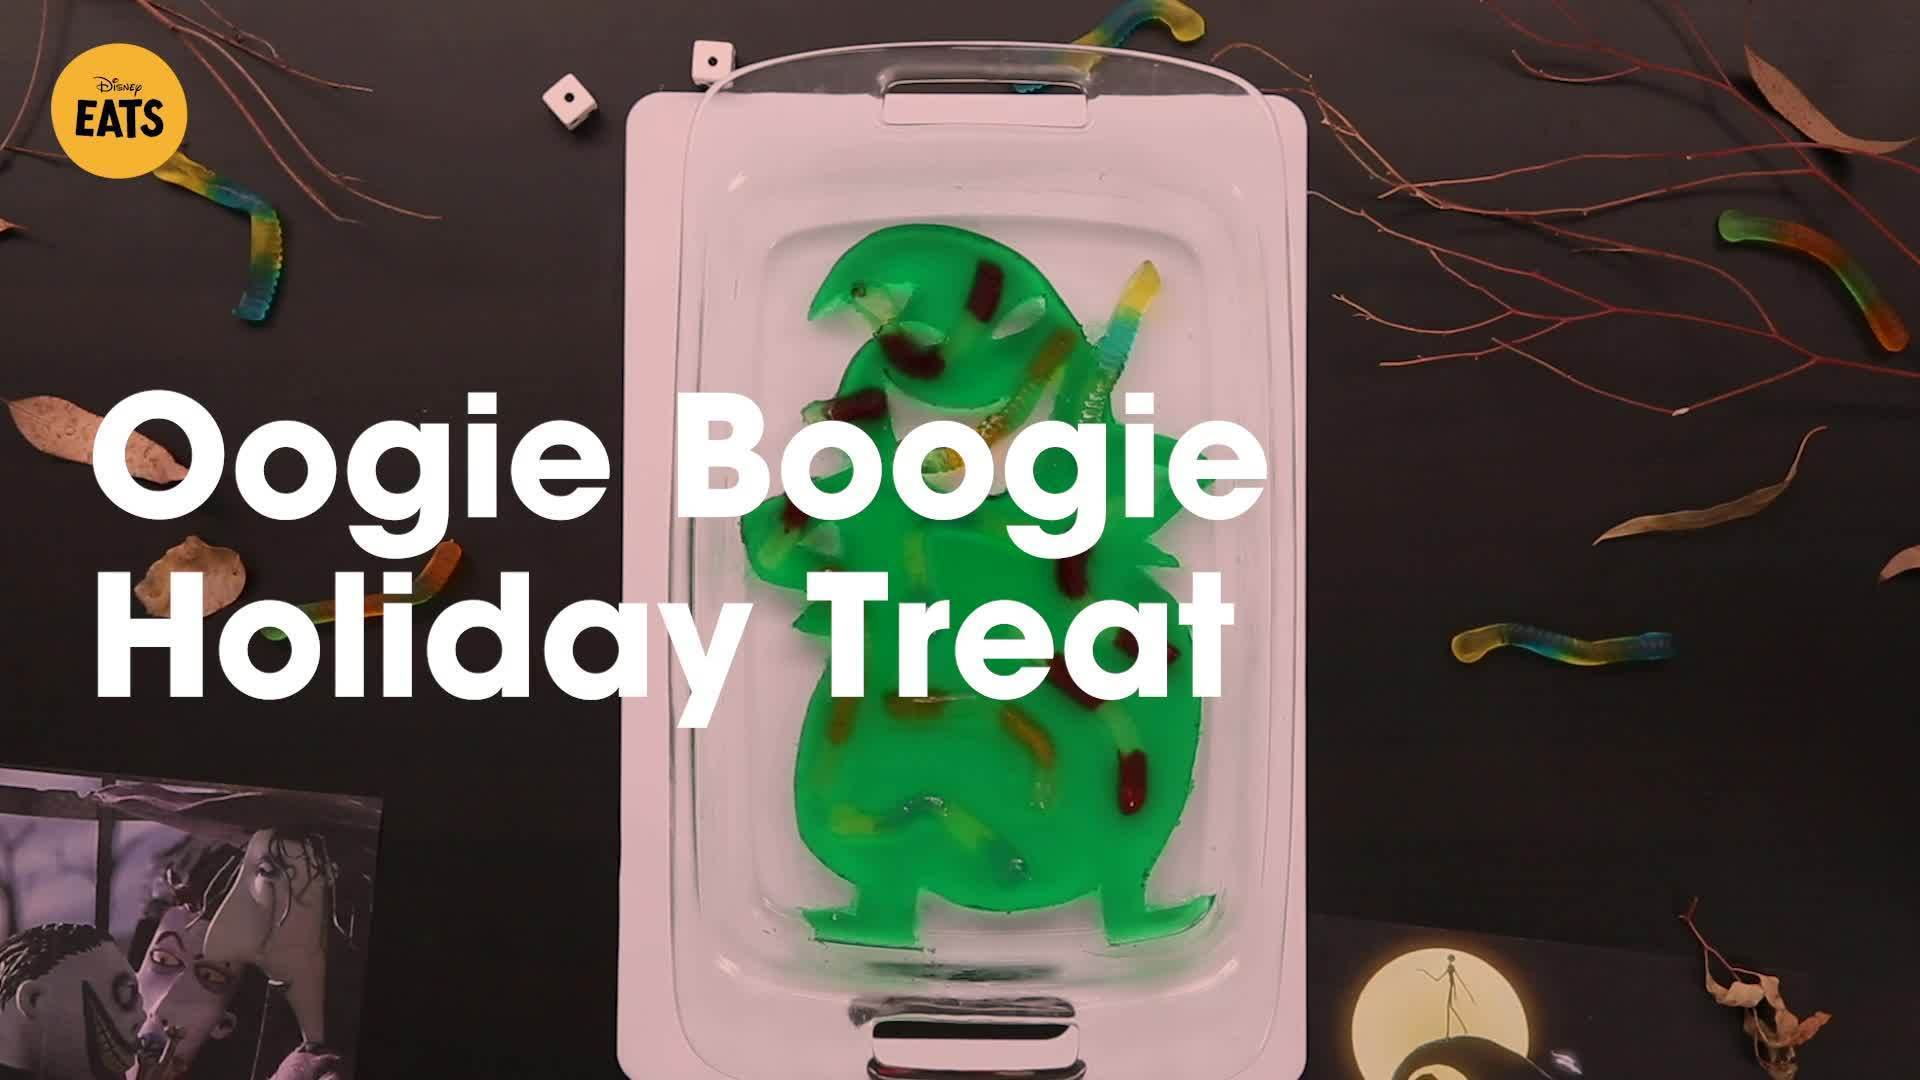 Oogie Boogie's Holiday Treat | Disney Eats